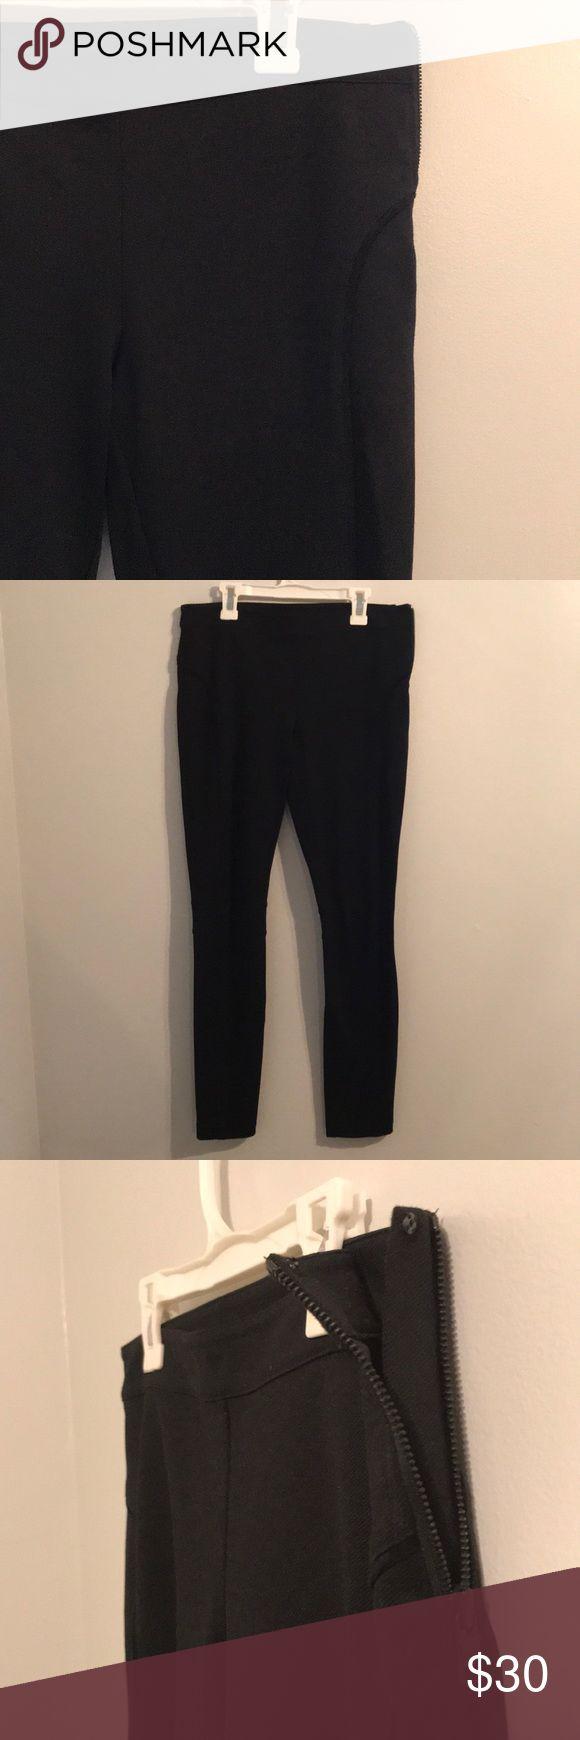 Armani Leggings Black Armani Exchange Leggings Left hip zip closure with c hook Never worn Armani Exchange Pants Leggings